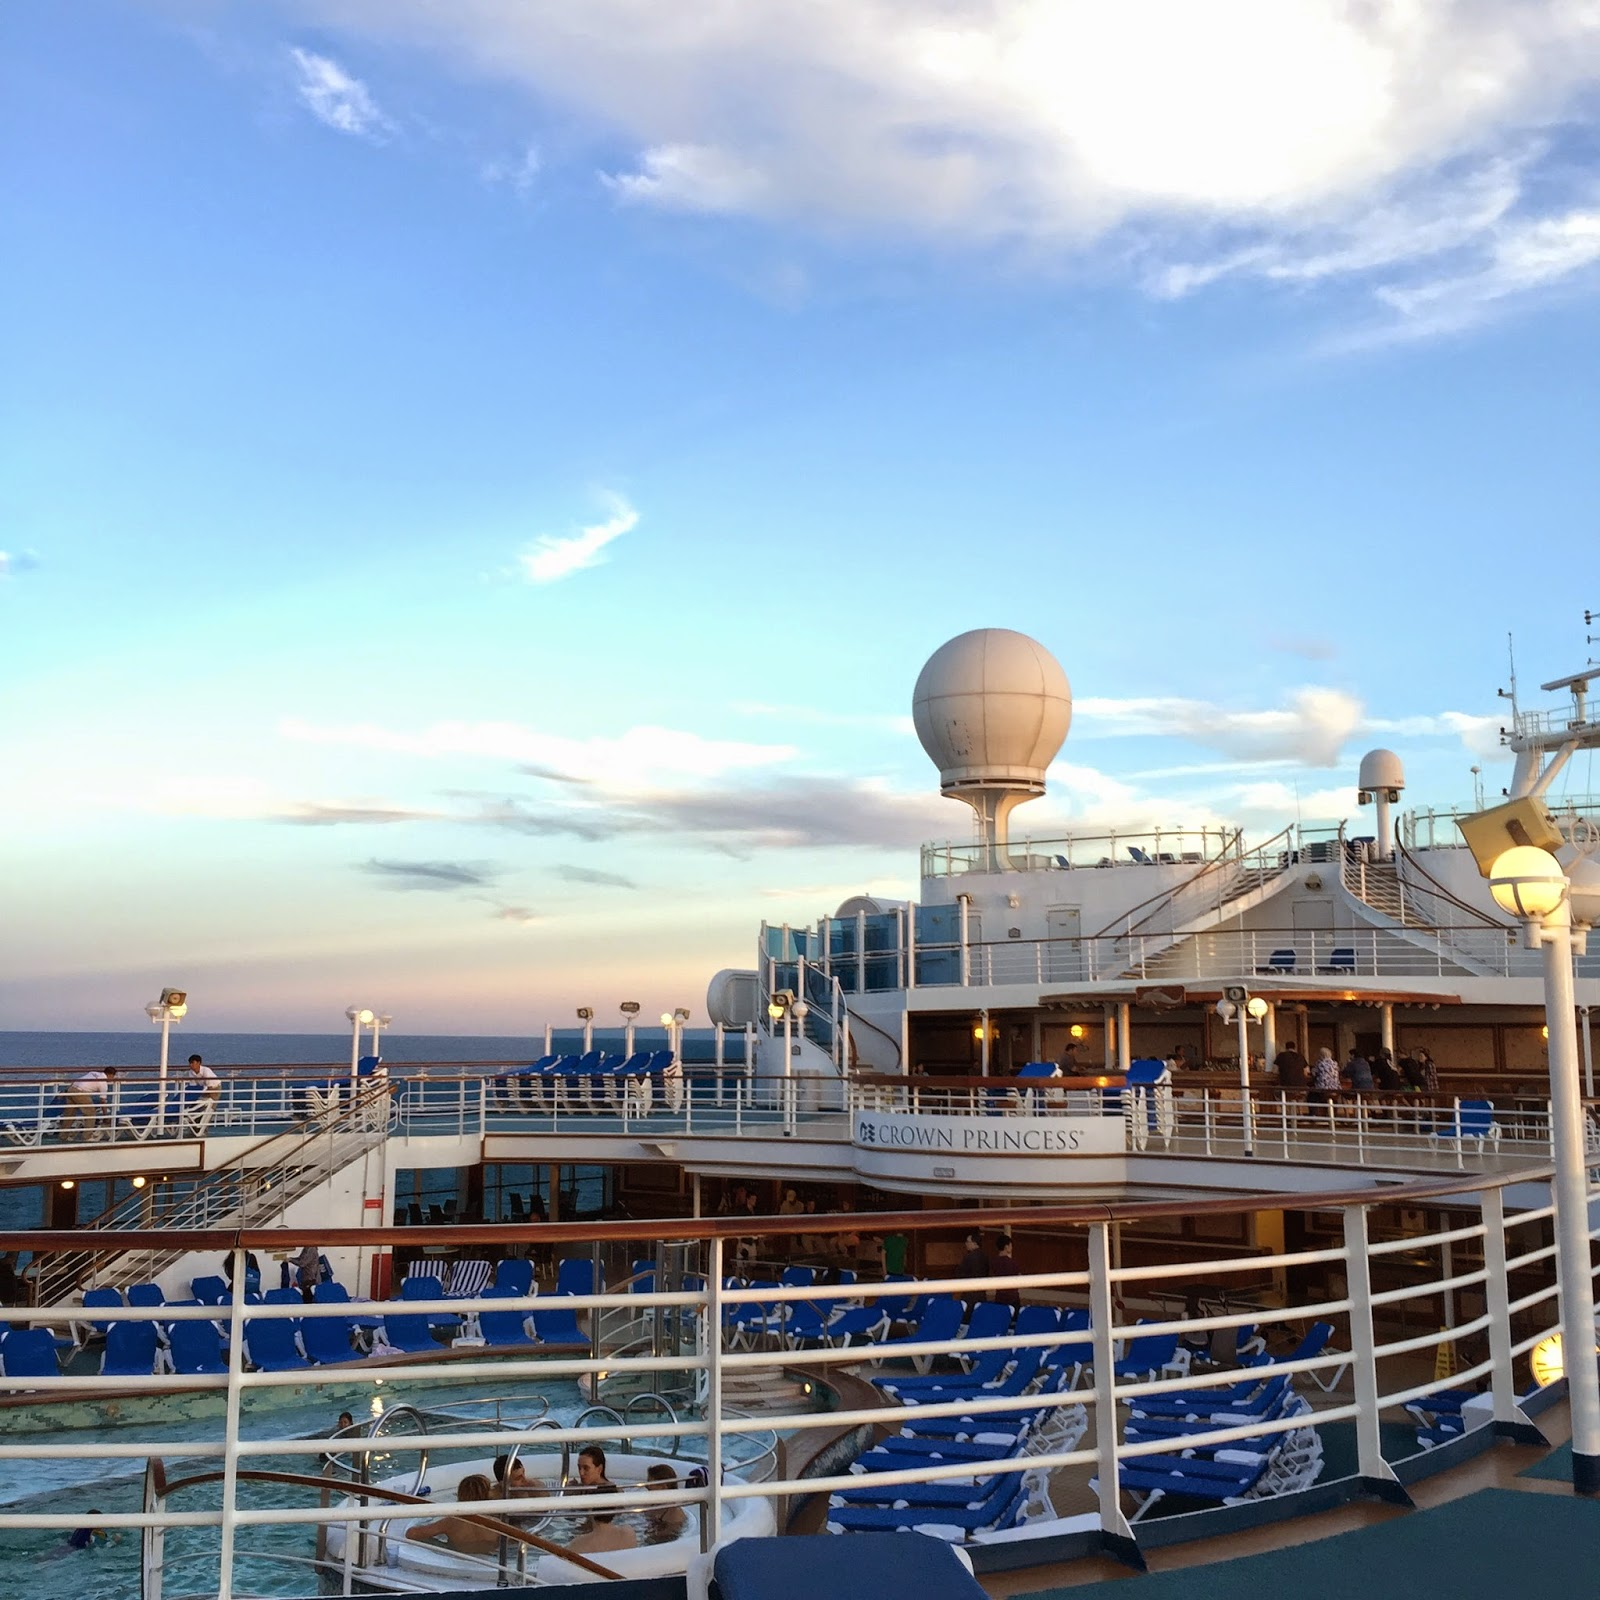 cruise tips, princess cruises, mexico cruise, how to cruise, cruise faqs